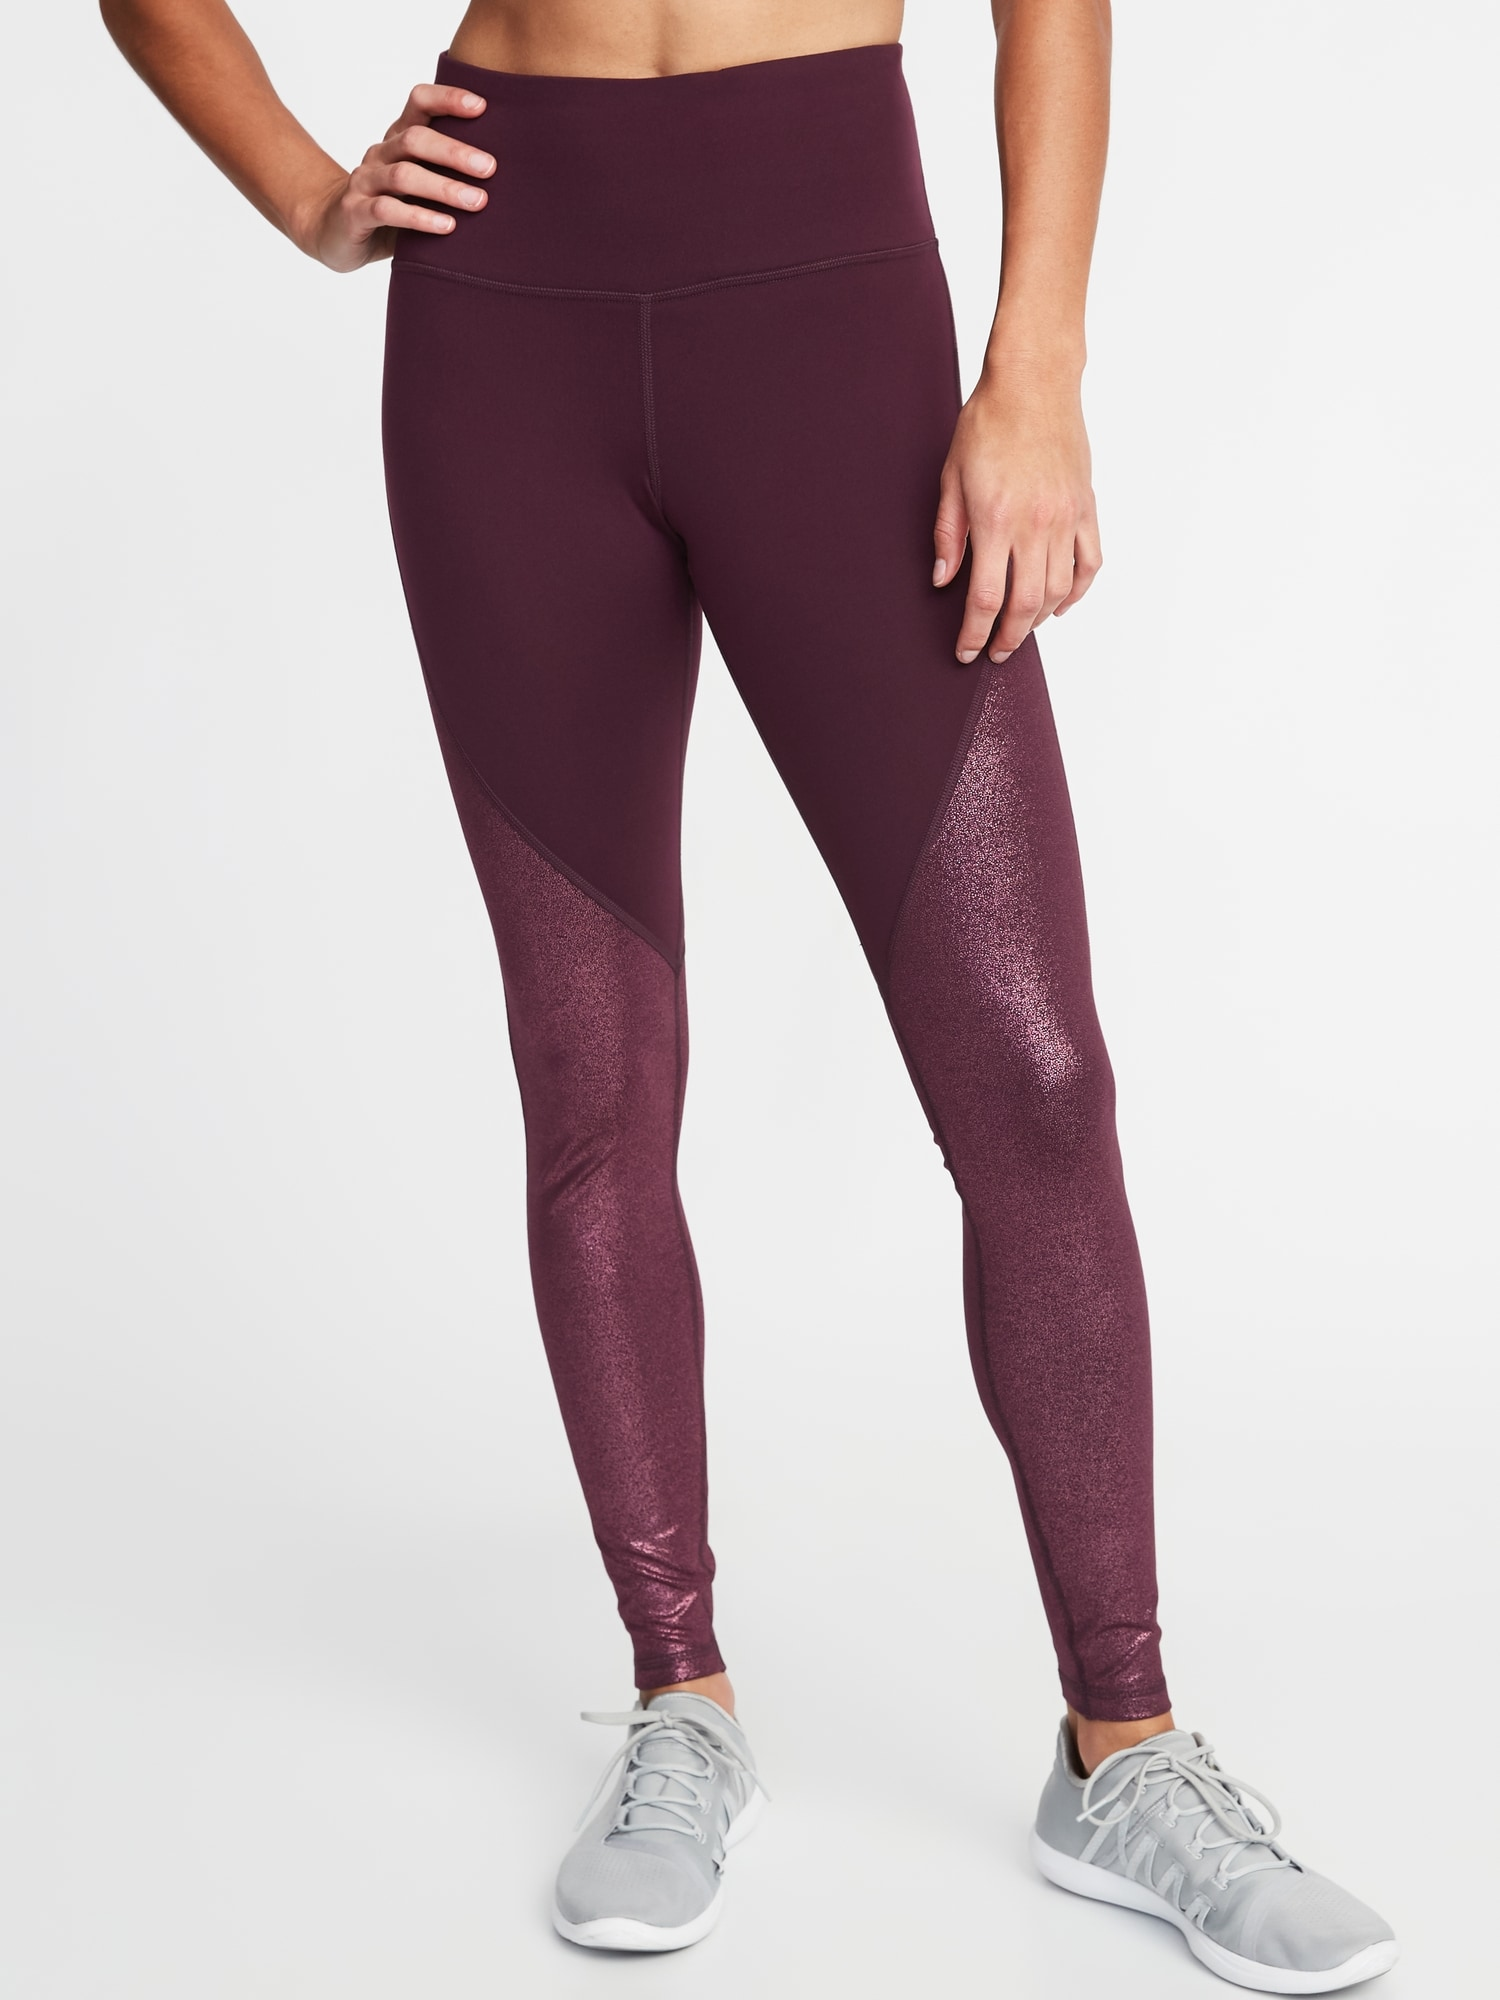 626b2a0ec4 High-Rise Shimmer Elevate Compression Full-Length Leggings for Women ...